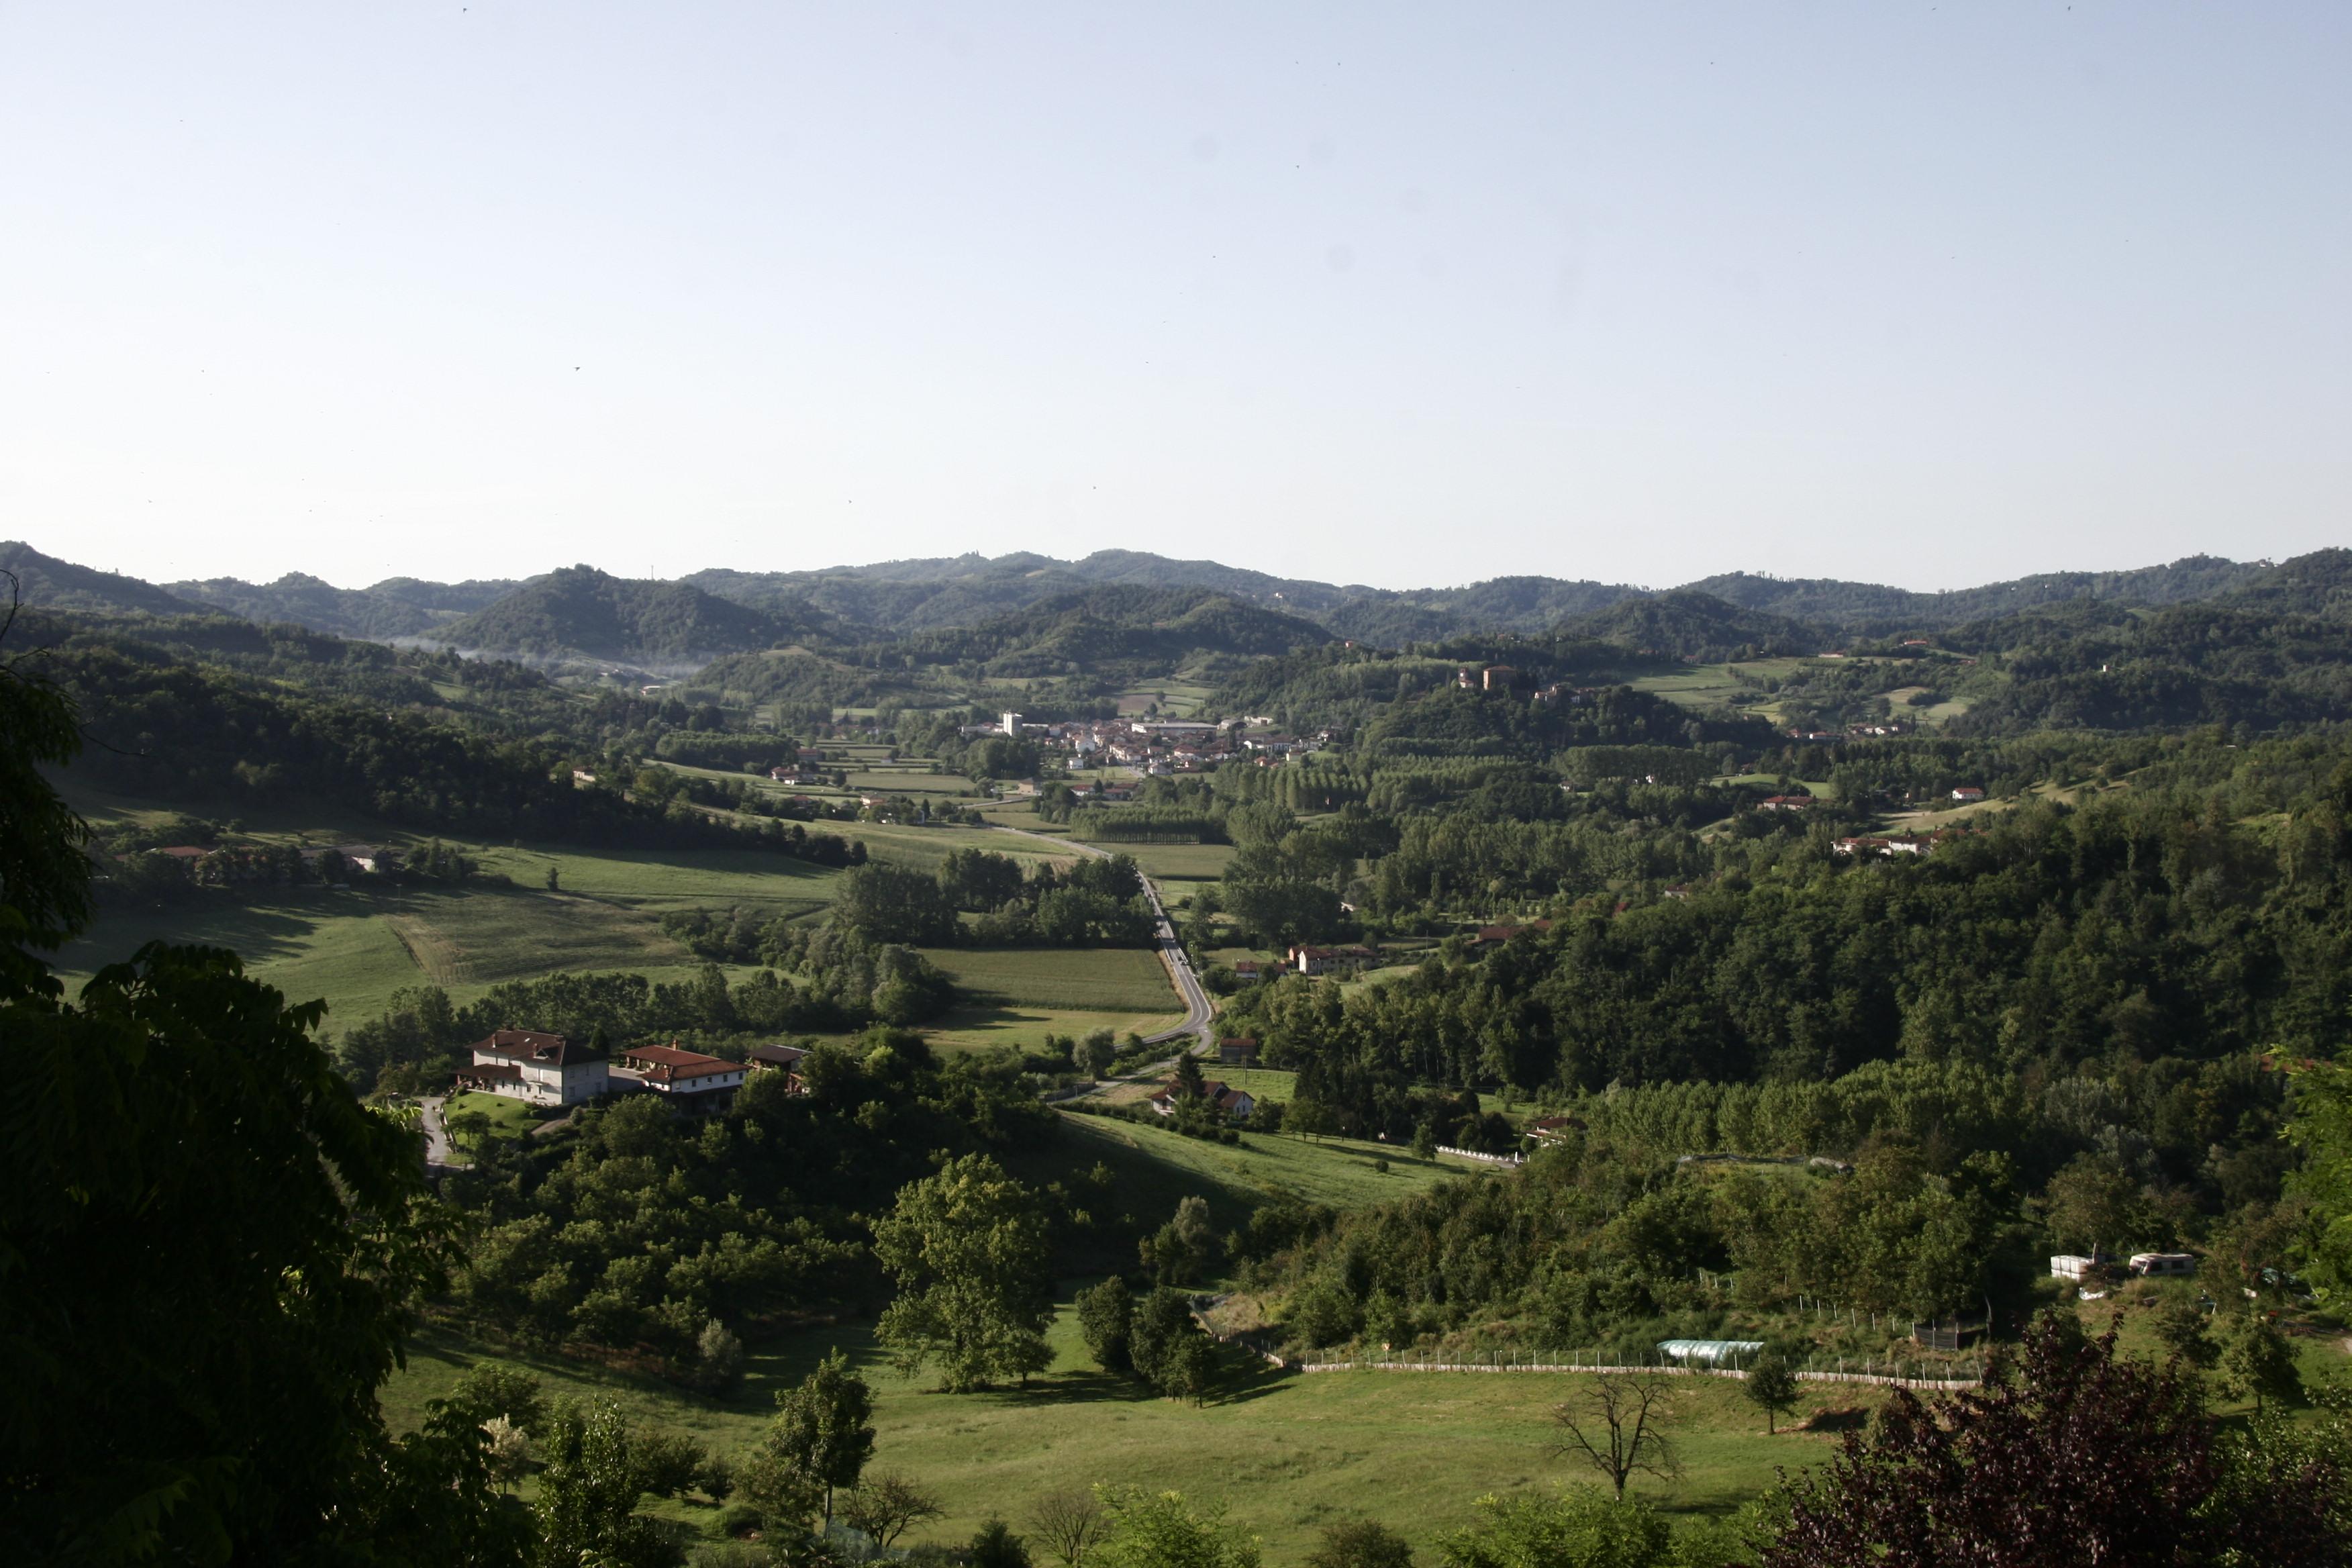 https://www.castellosansebastiano.it/wp-content/uploads/MG_2172.jpg